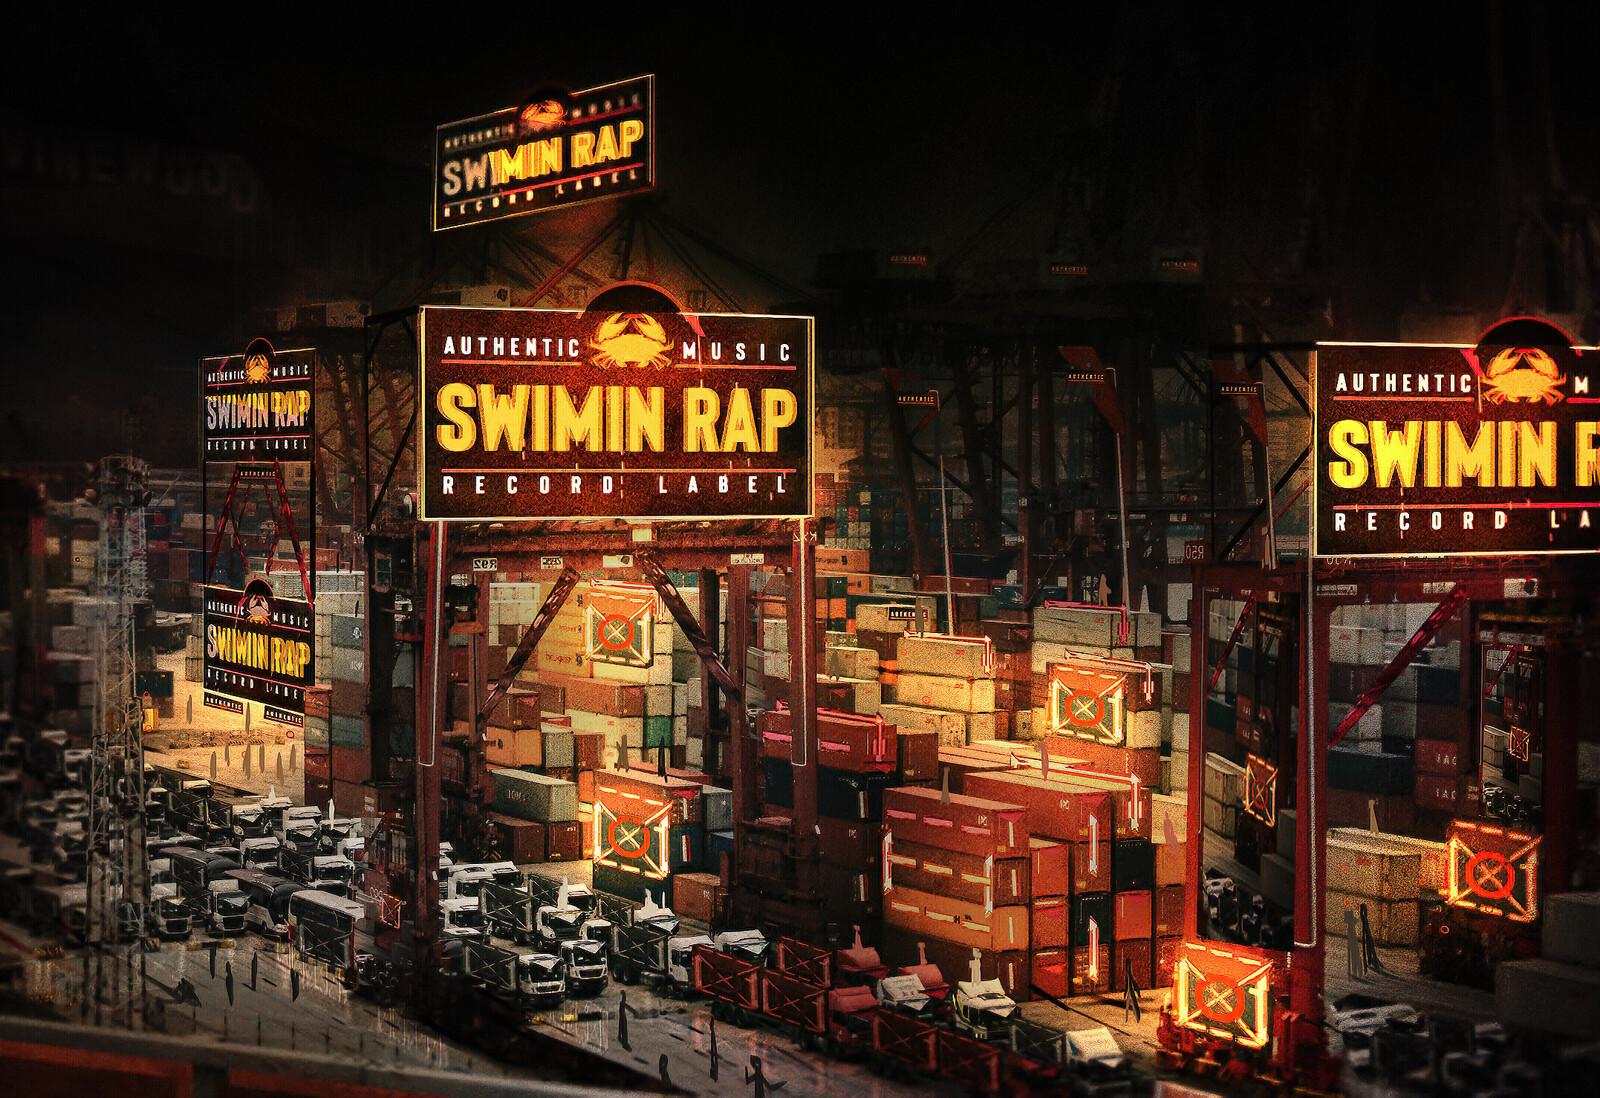 SWIMIN RAP {NightMask}